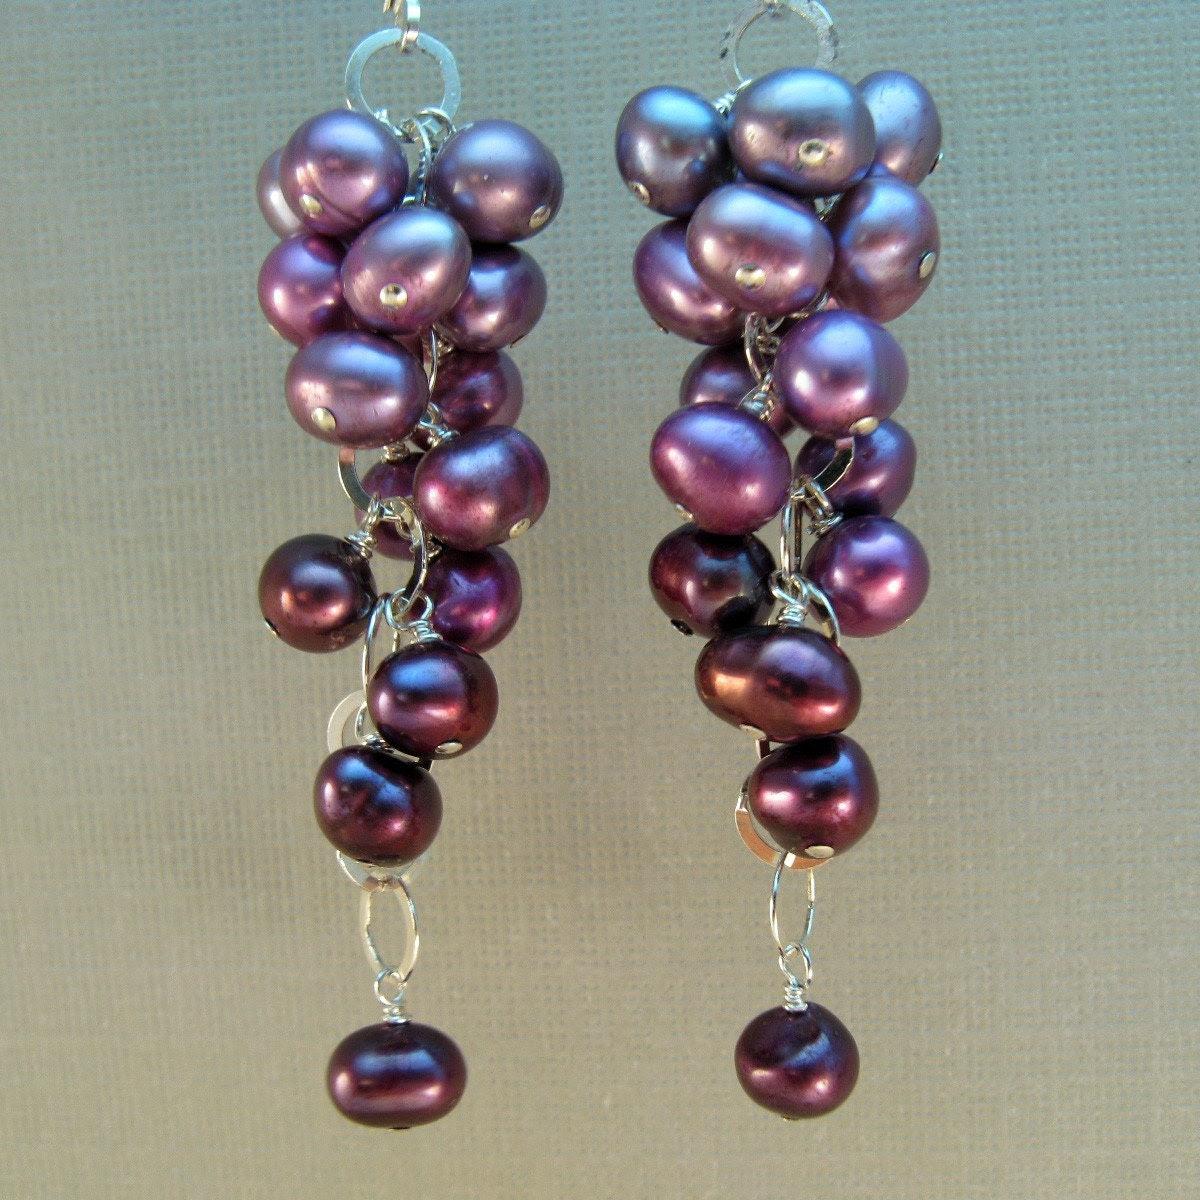 Earrings - Lavender Freshwater Pearls and Sterling Silver, June Birthstone - Napa